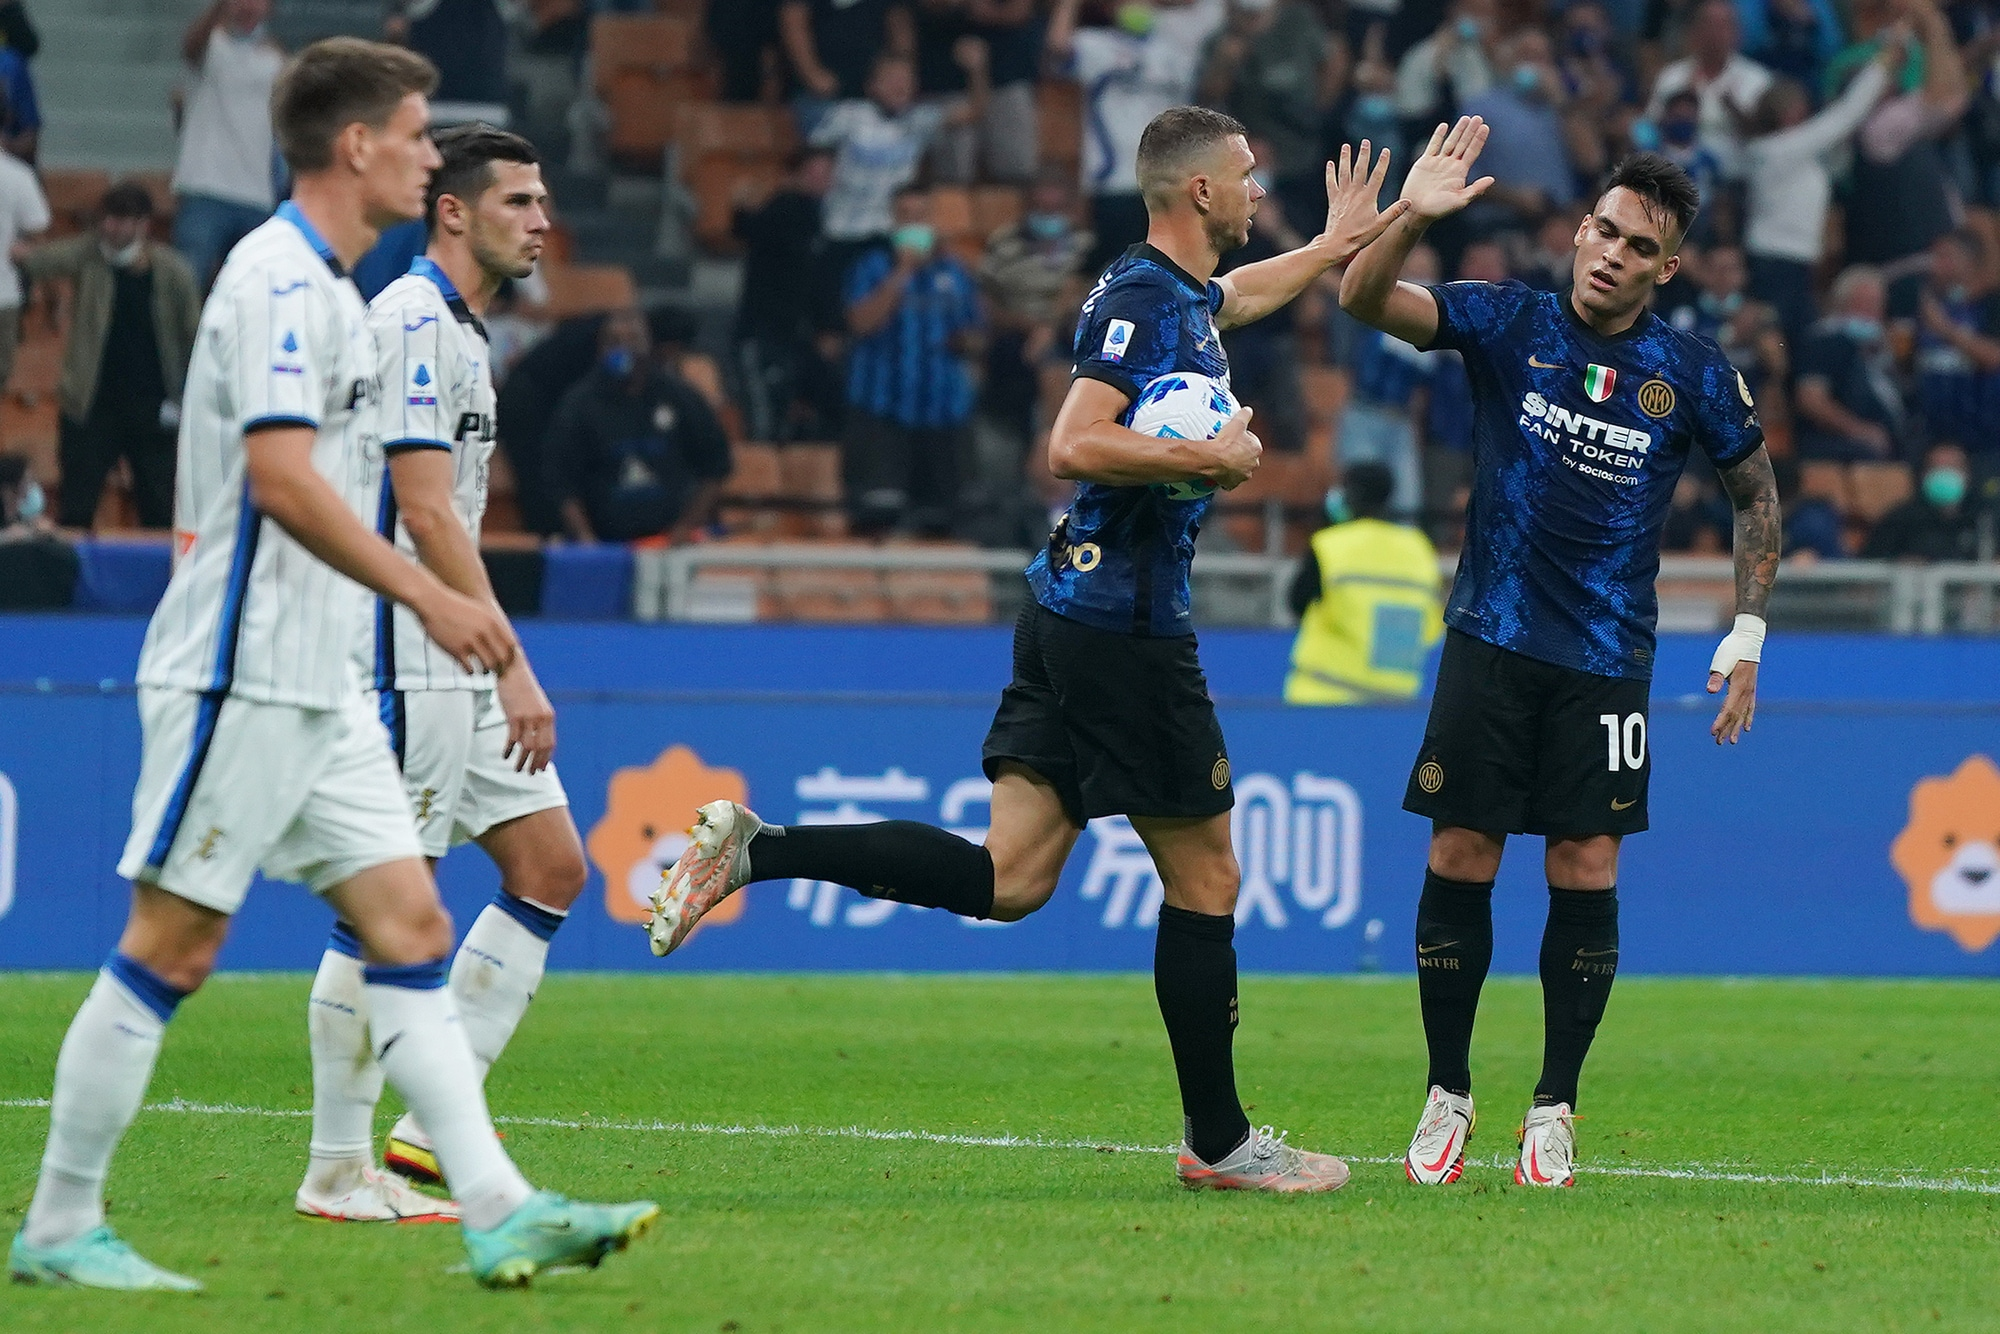 Dzeko salva l'Inter contro un'Atalanta show: Malinovskyi, che gol!